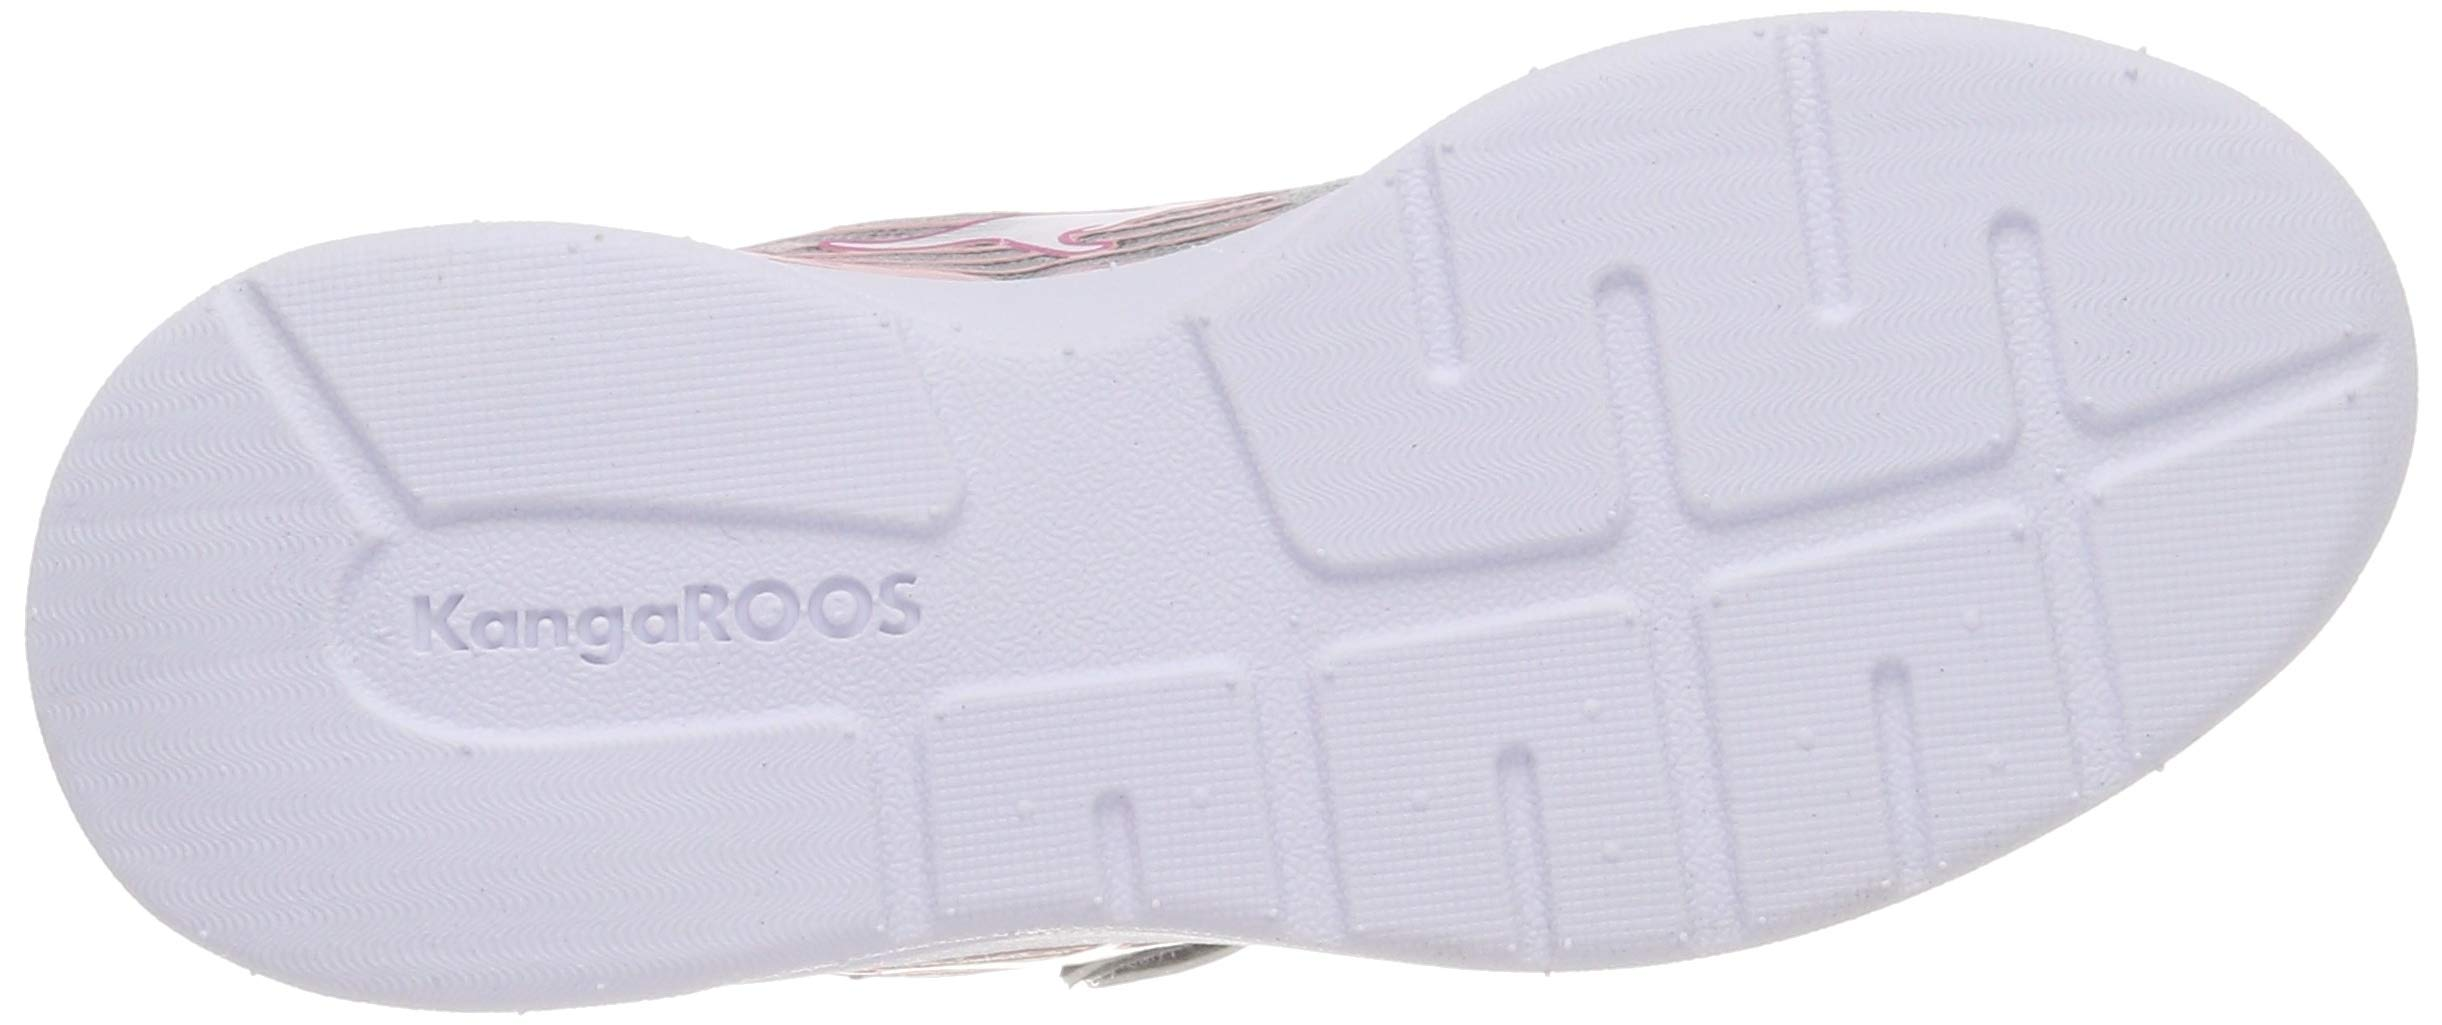 factory price 9cbfe 35fe1 Amazon.de  KangaROOS